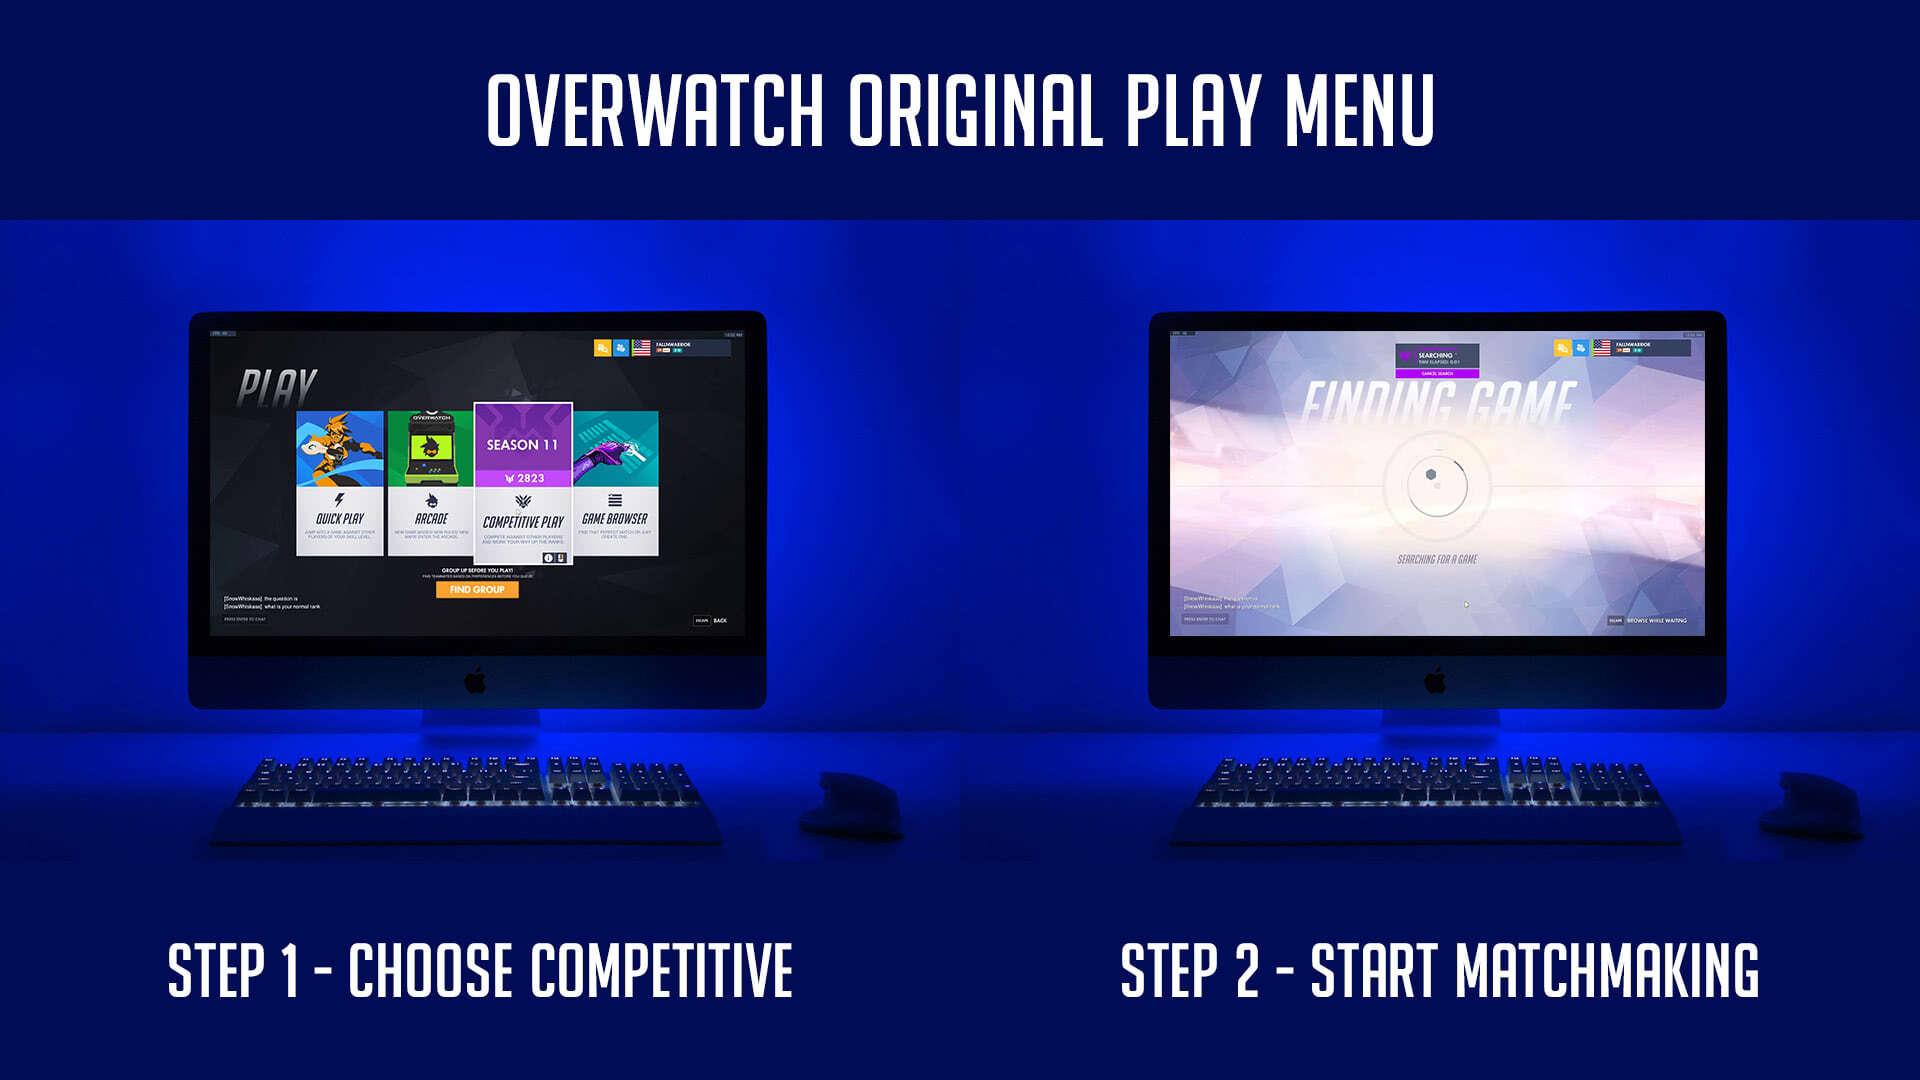 Overwatch Original Play Menu UI Steps To Start Multiplayer Matchmaking